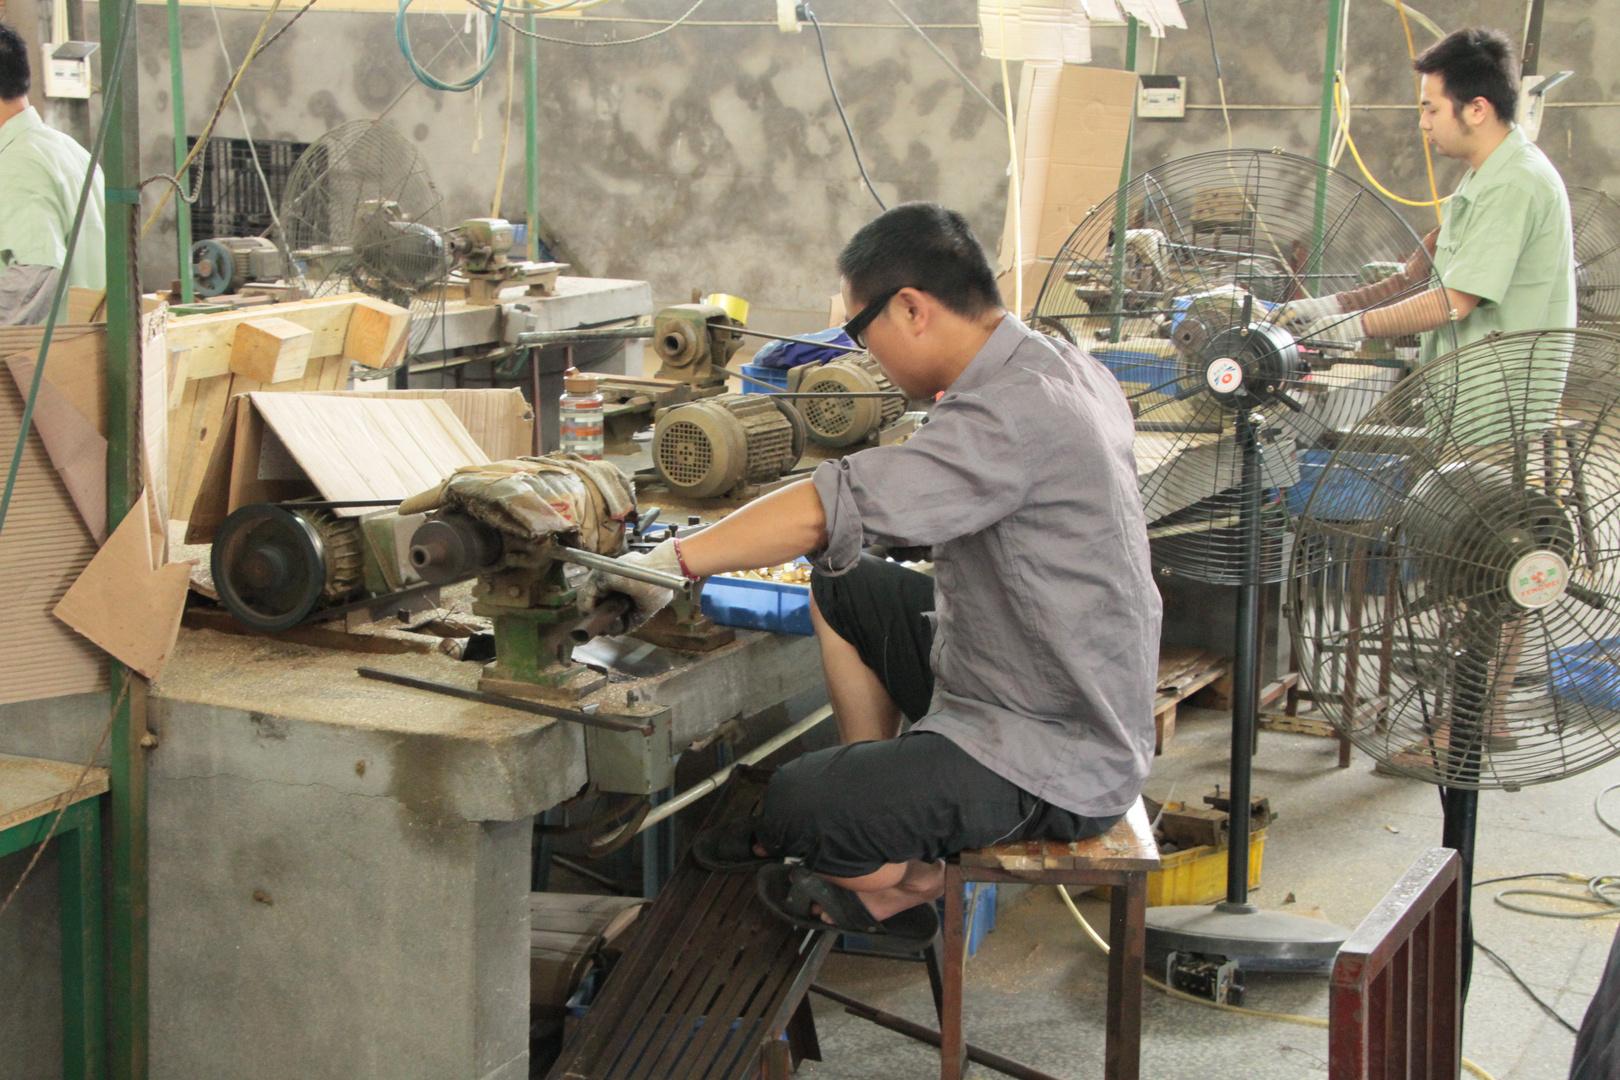 Einfache Produktion in China